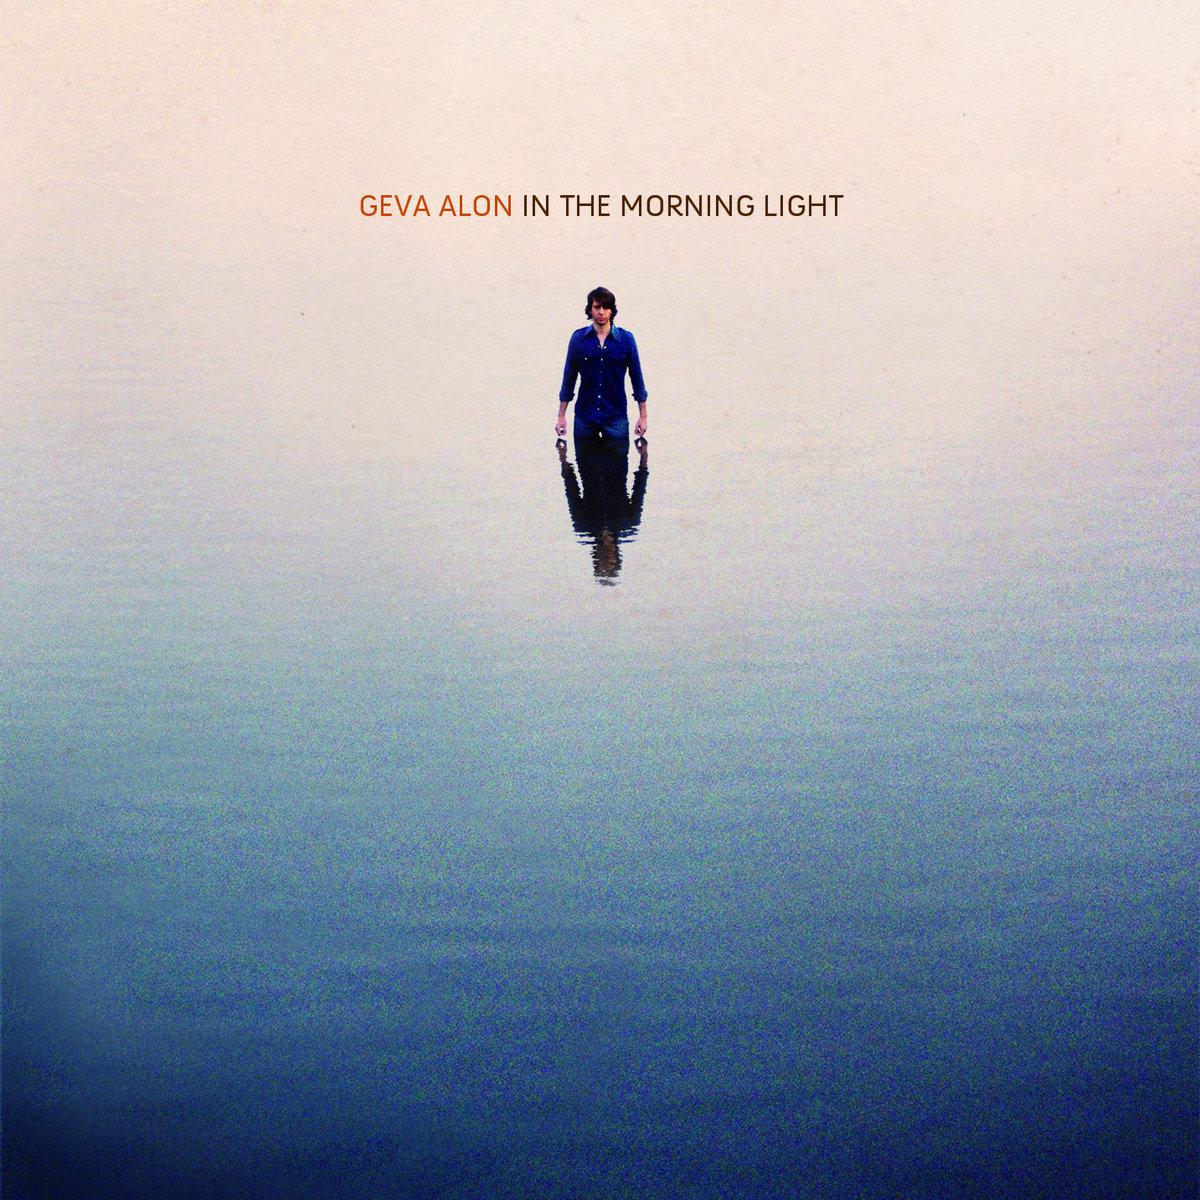 Morning Light >> In The Morning Light Geva Alon